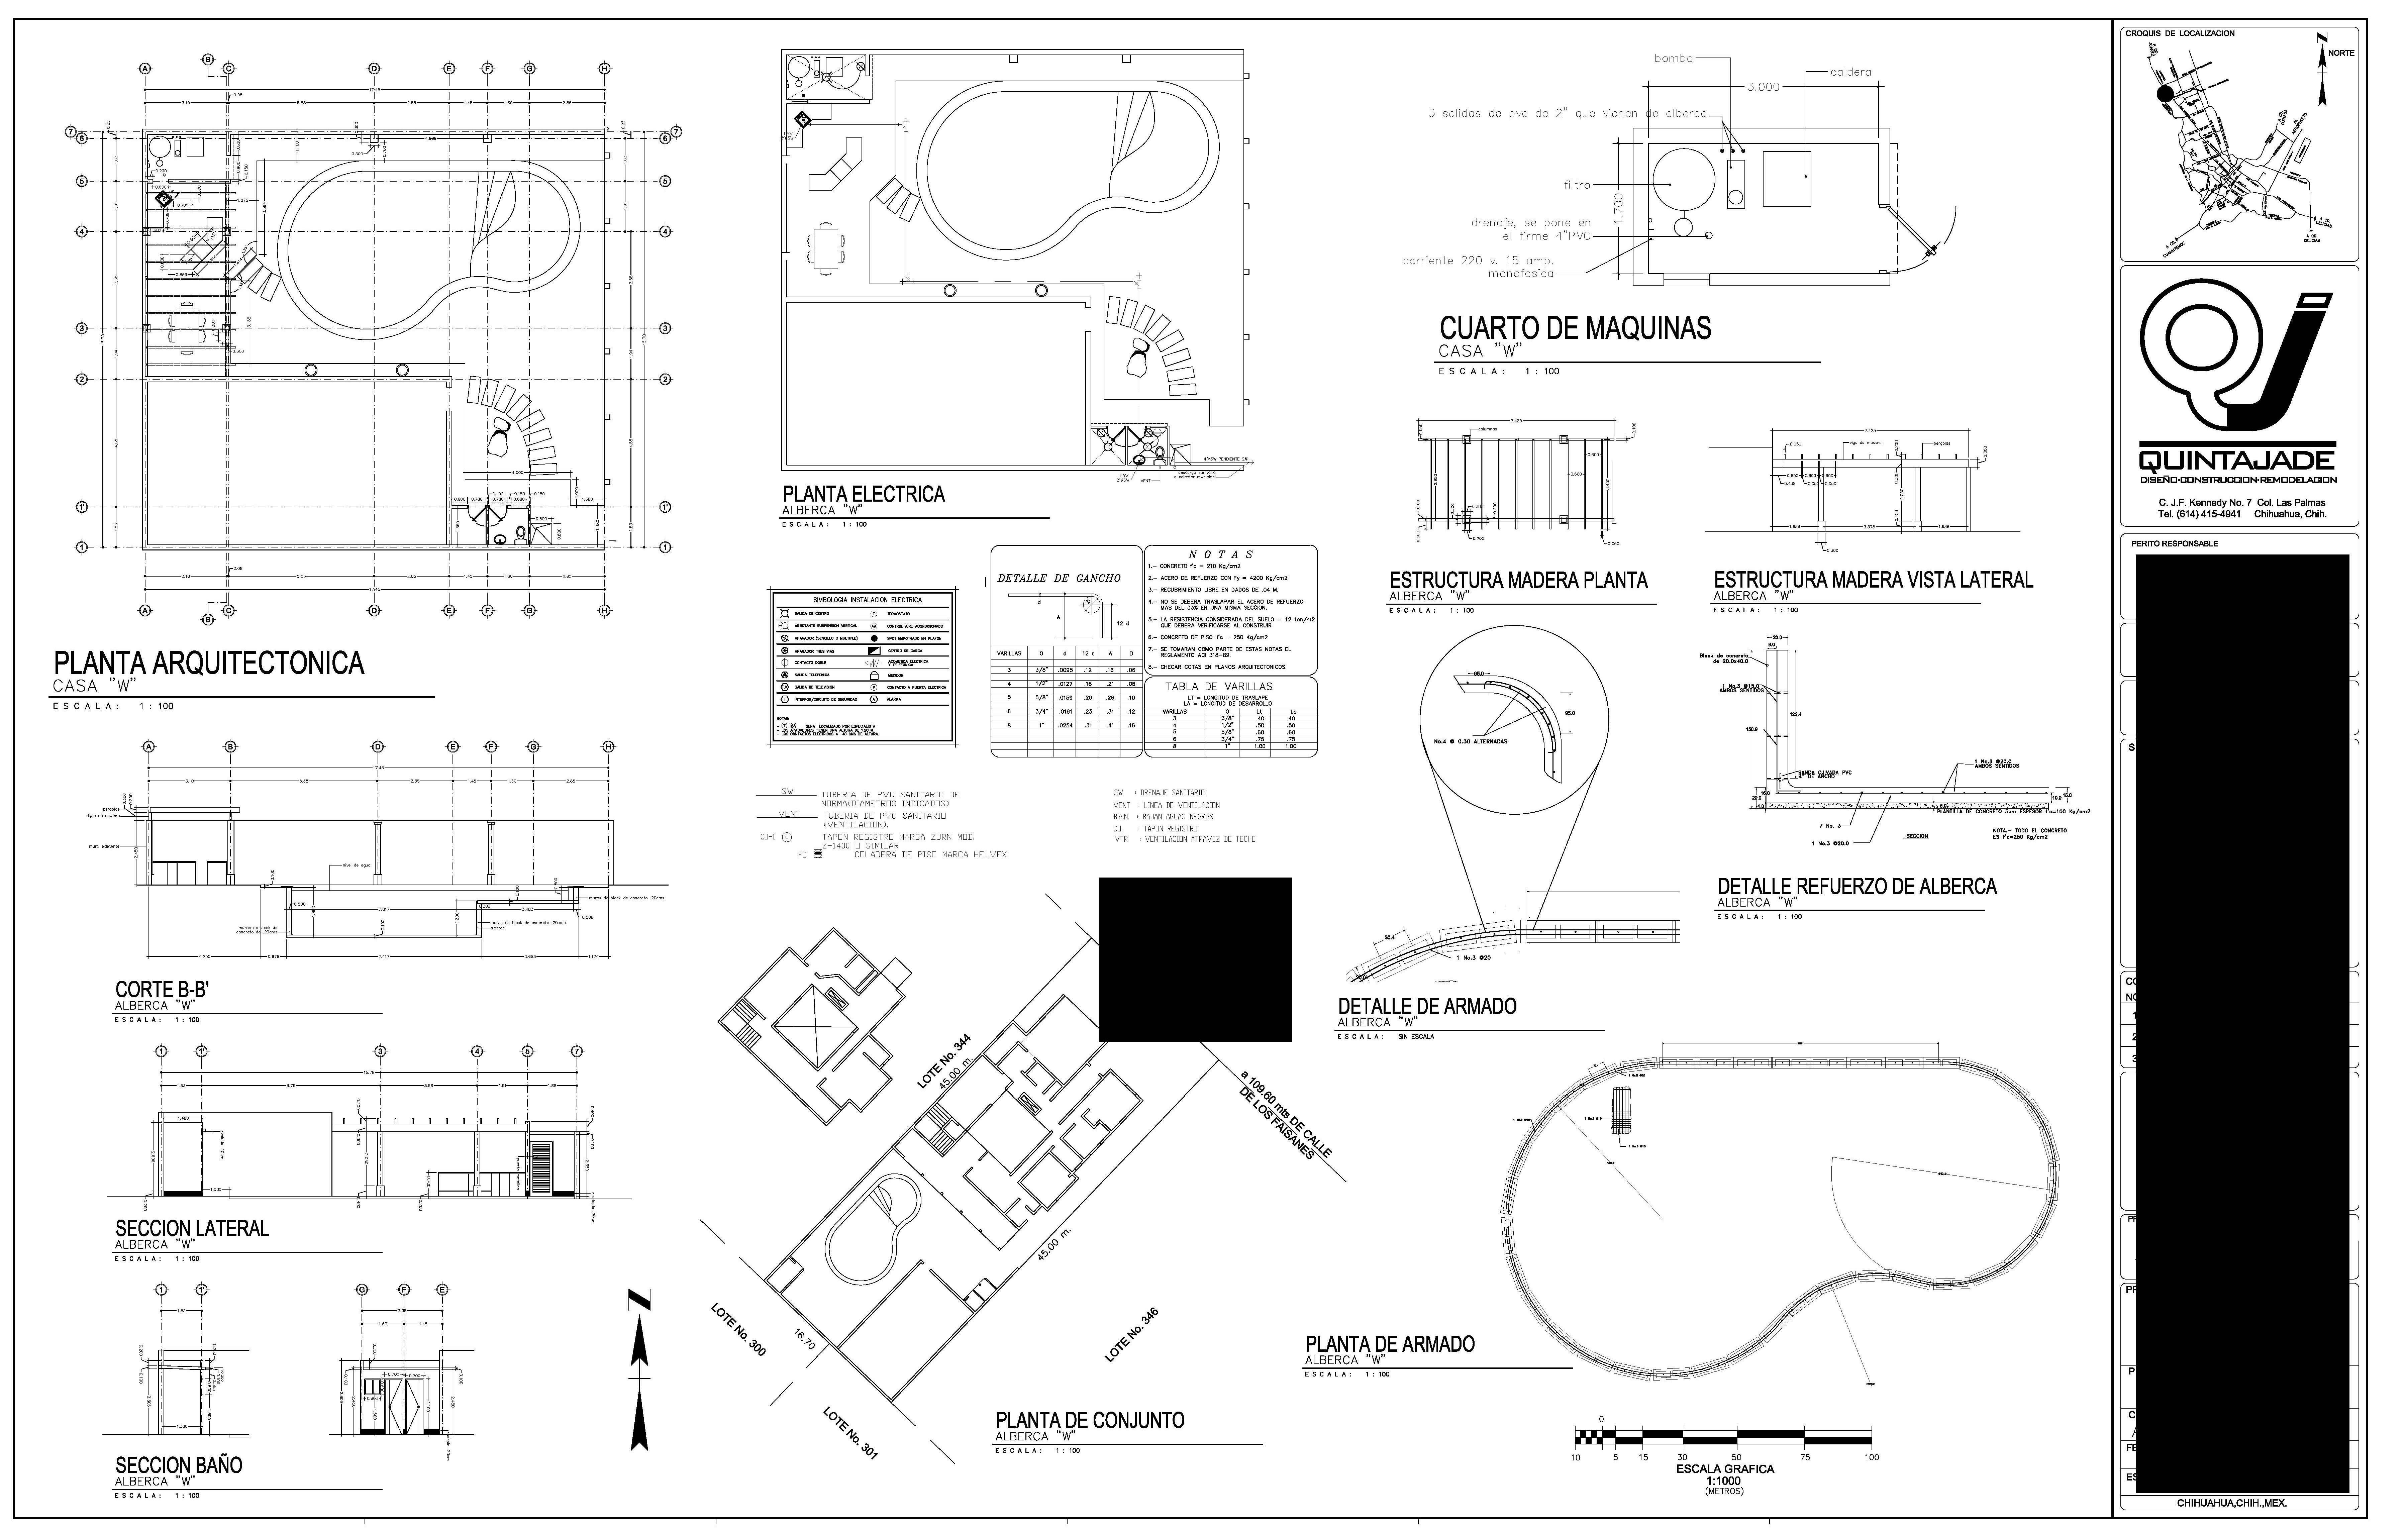 090302 planos alberca esqueda layout1 3 1 quinta jade